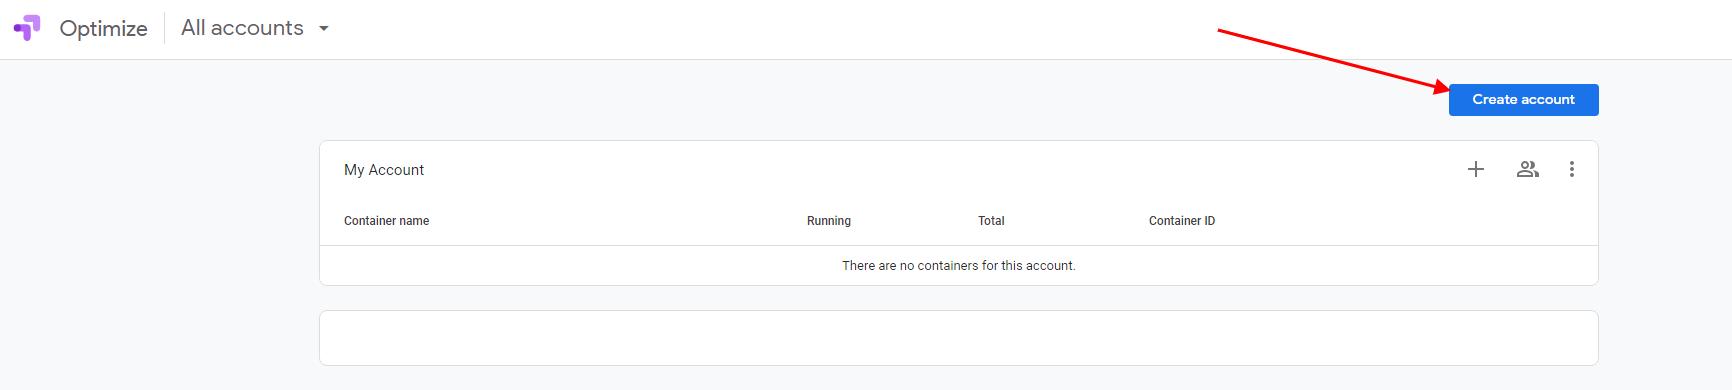 Google Optimize Account creation